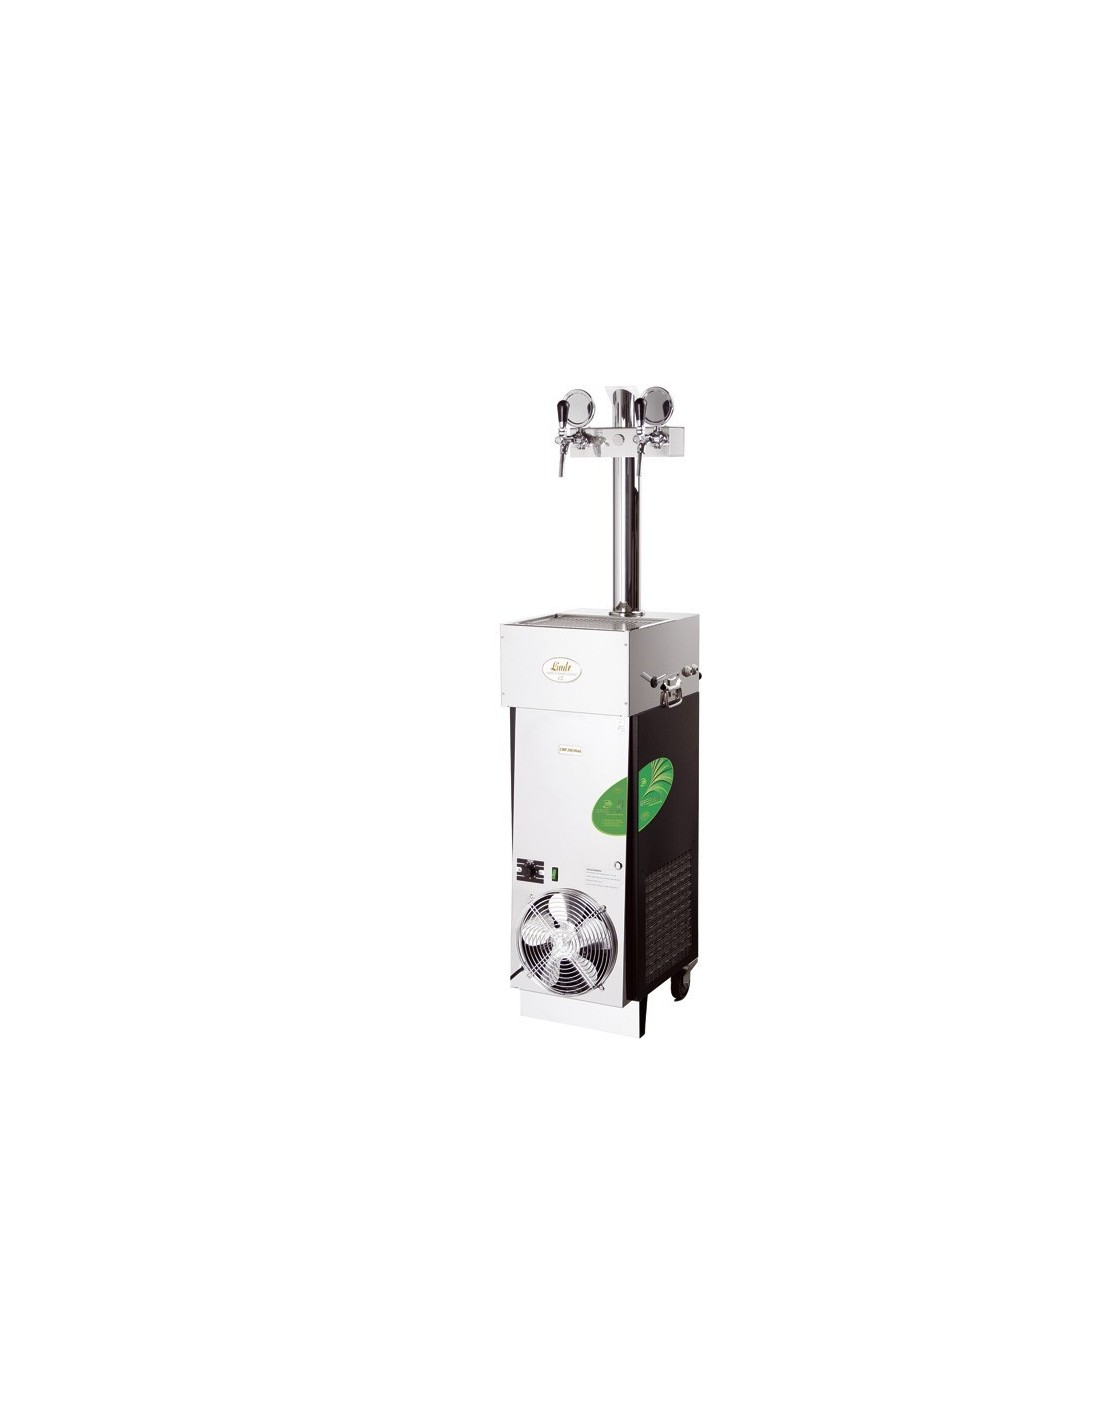 "CWP00478 - Vätskekylda fatölskylare med isbank - Lindr CWP 200 mobil ""green line"" mobil enhet med 2 kranar"